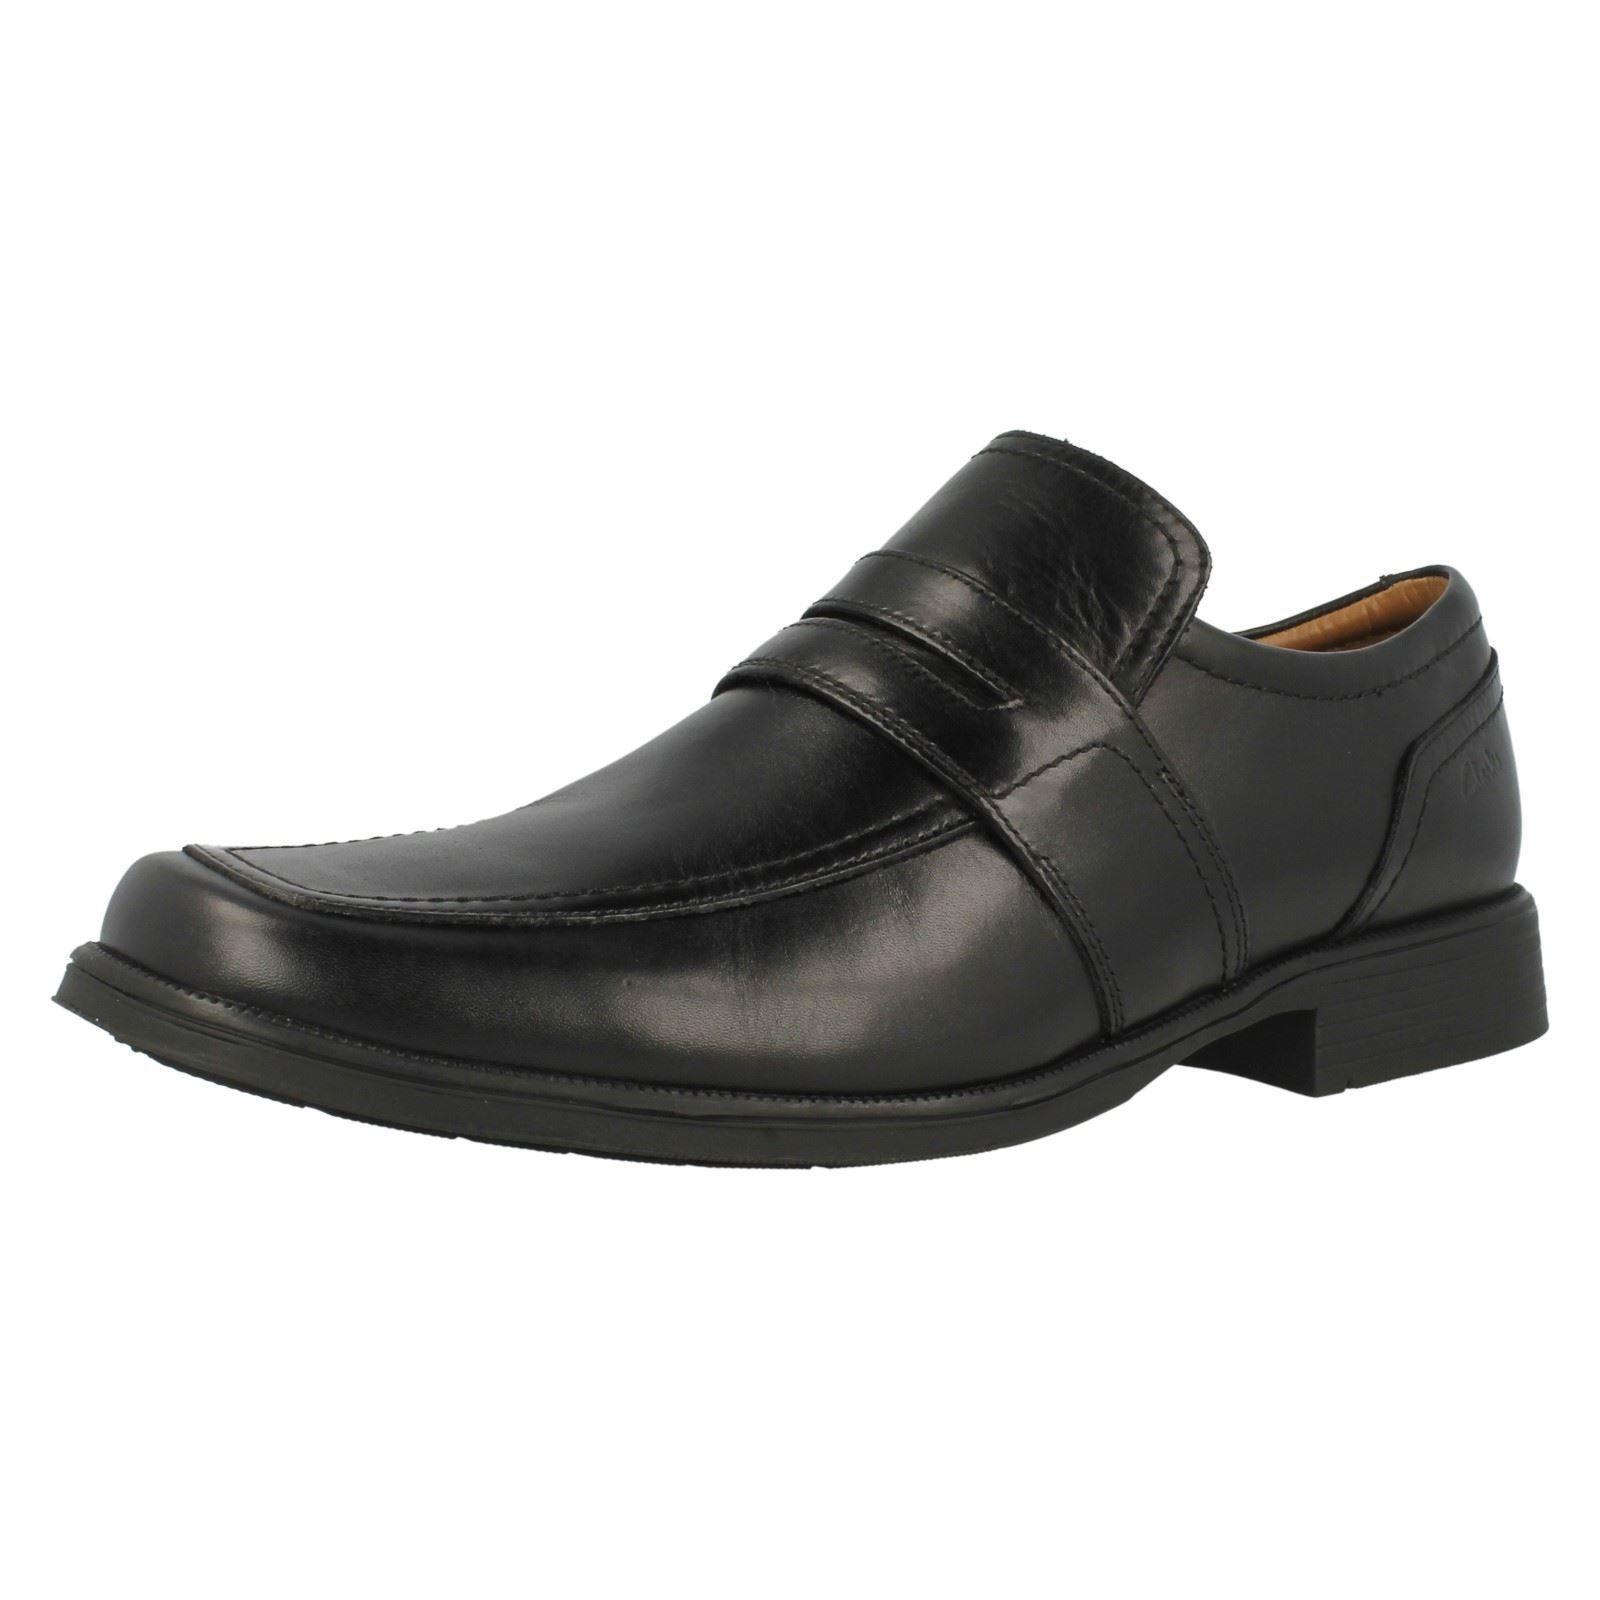 Herren Clarks huckley Works schwarzes schwarzes schwarzes Leder elegant Slip On Schuhe G PASSFORM 02de0f